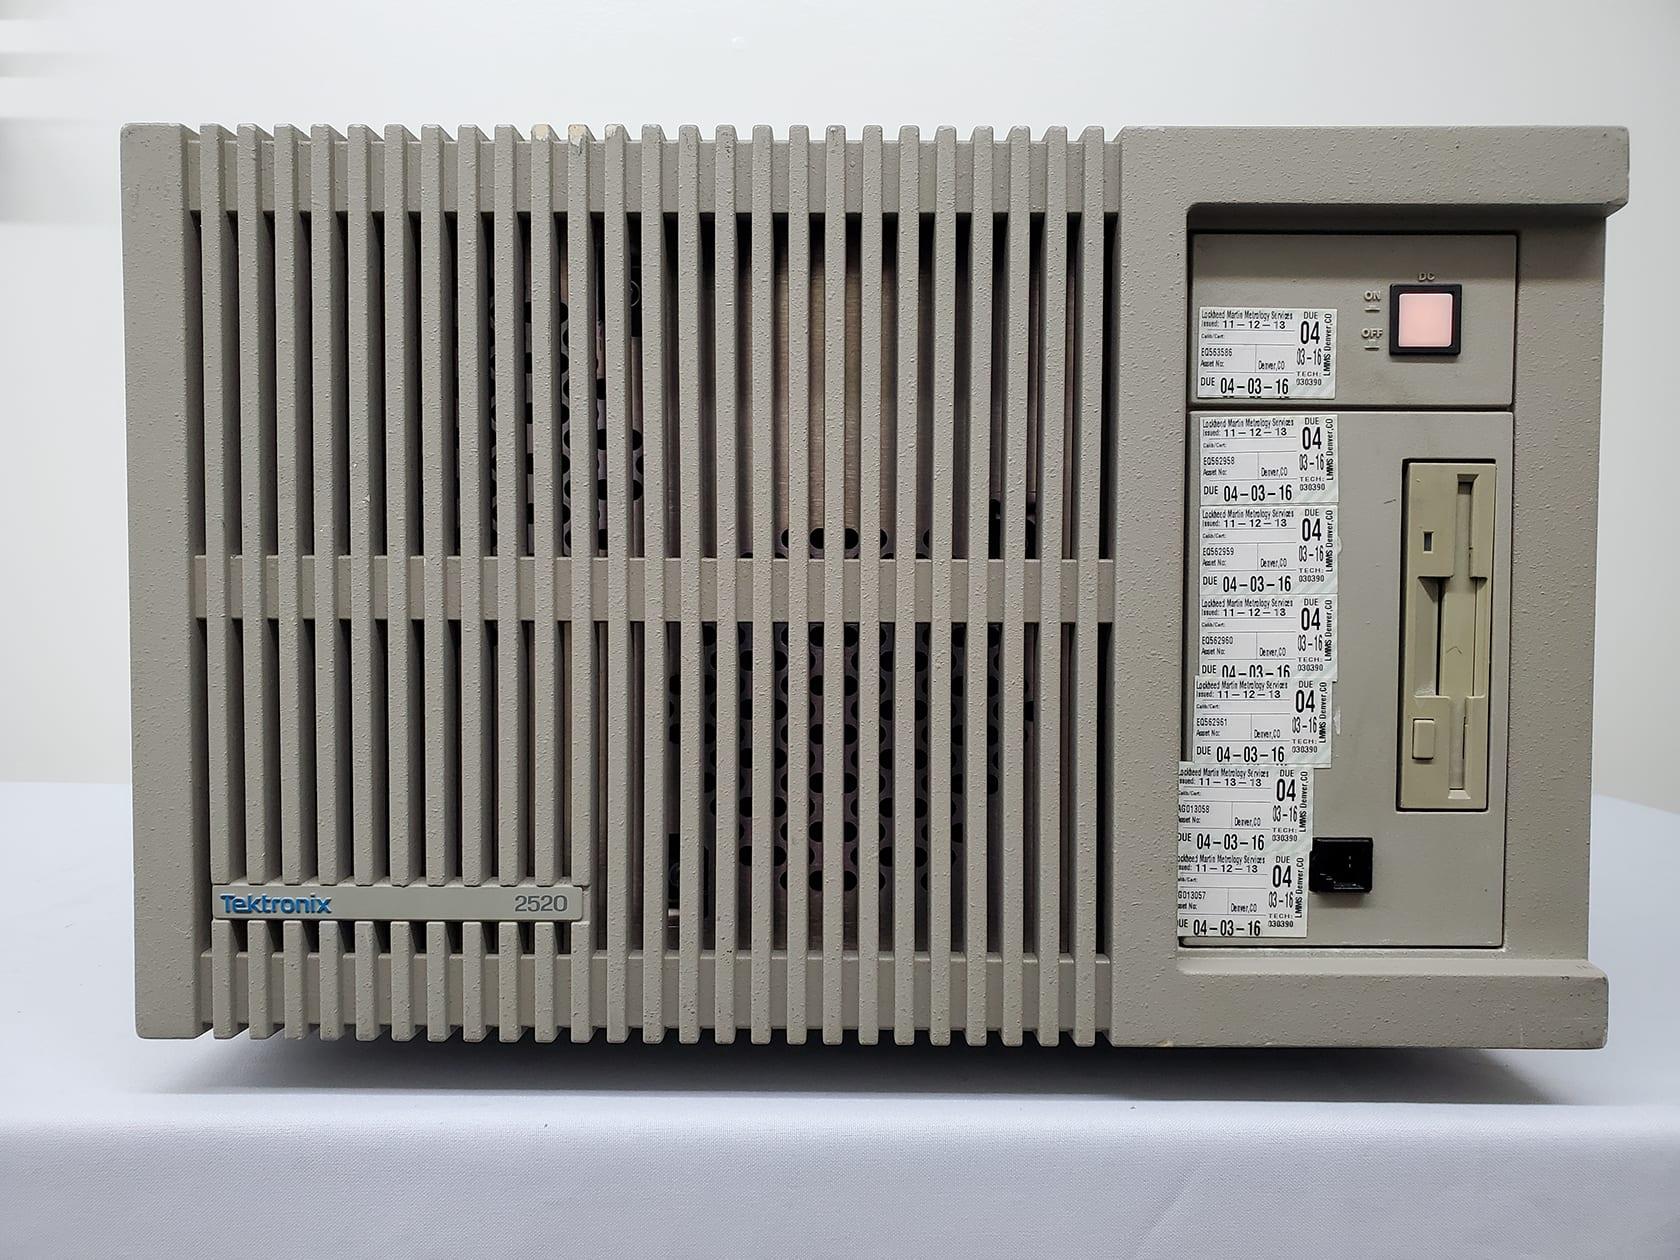 Tektronix 2520 6 Slot Mainframe Test Lab Multi-Channel Wave Analyzer -59990 For Sale